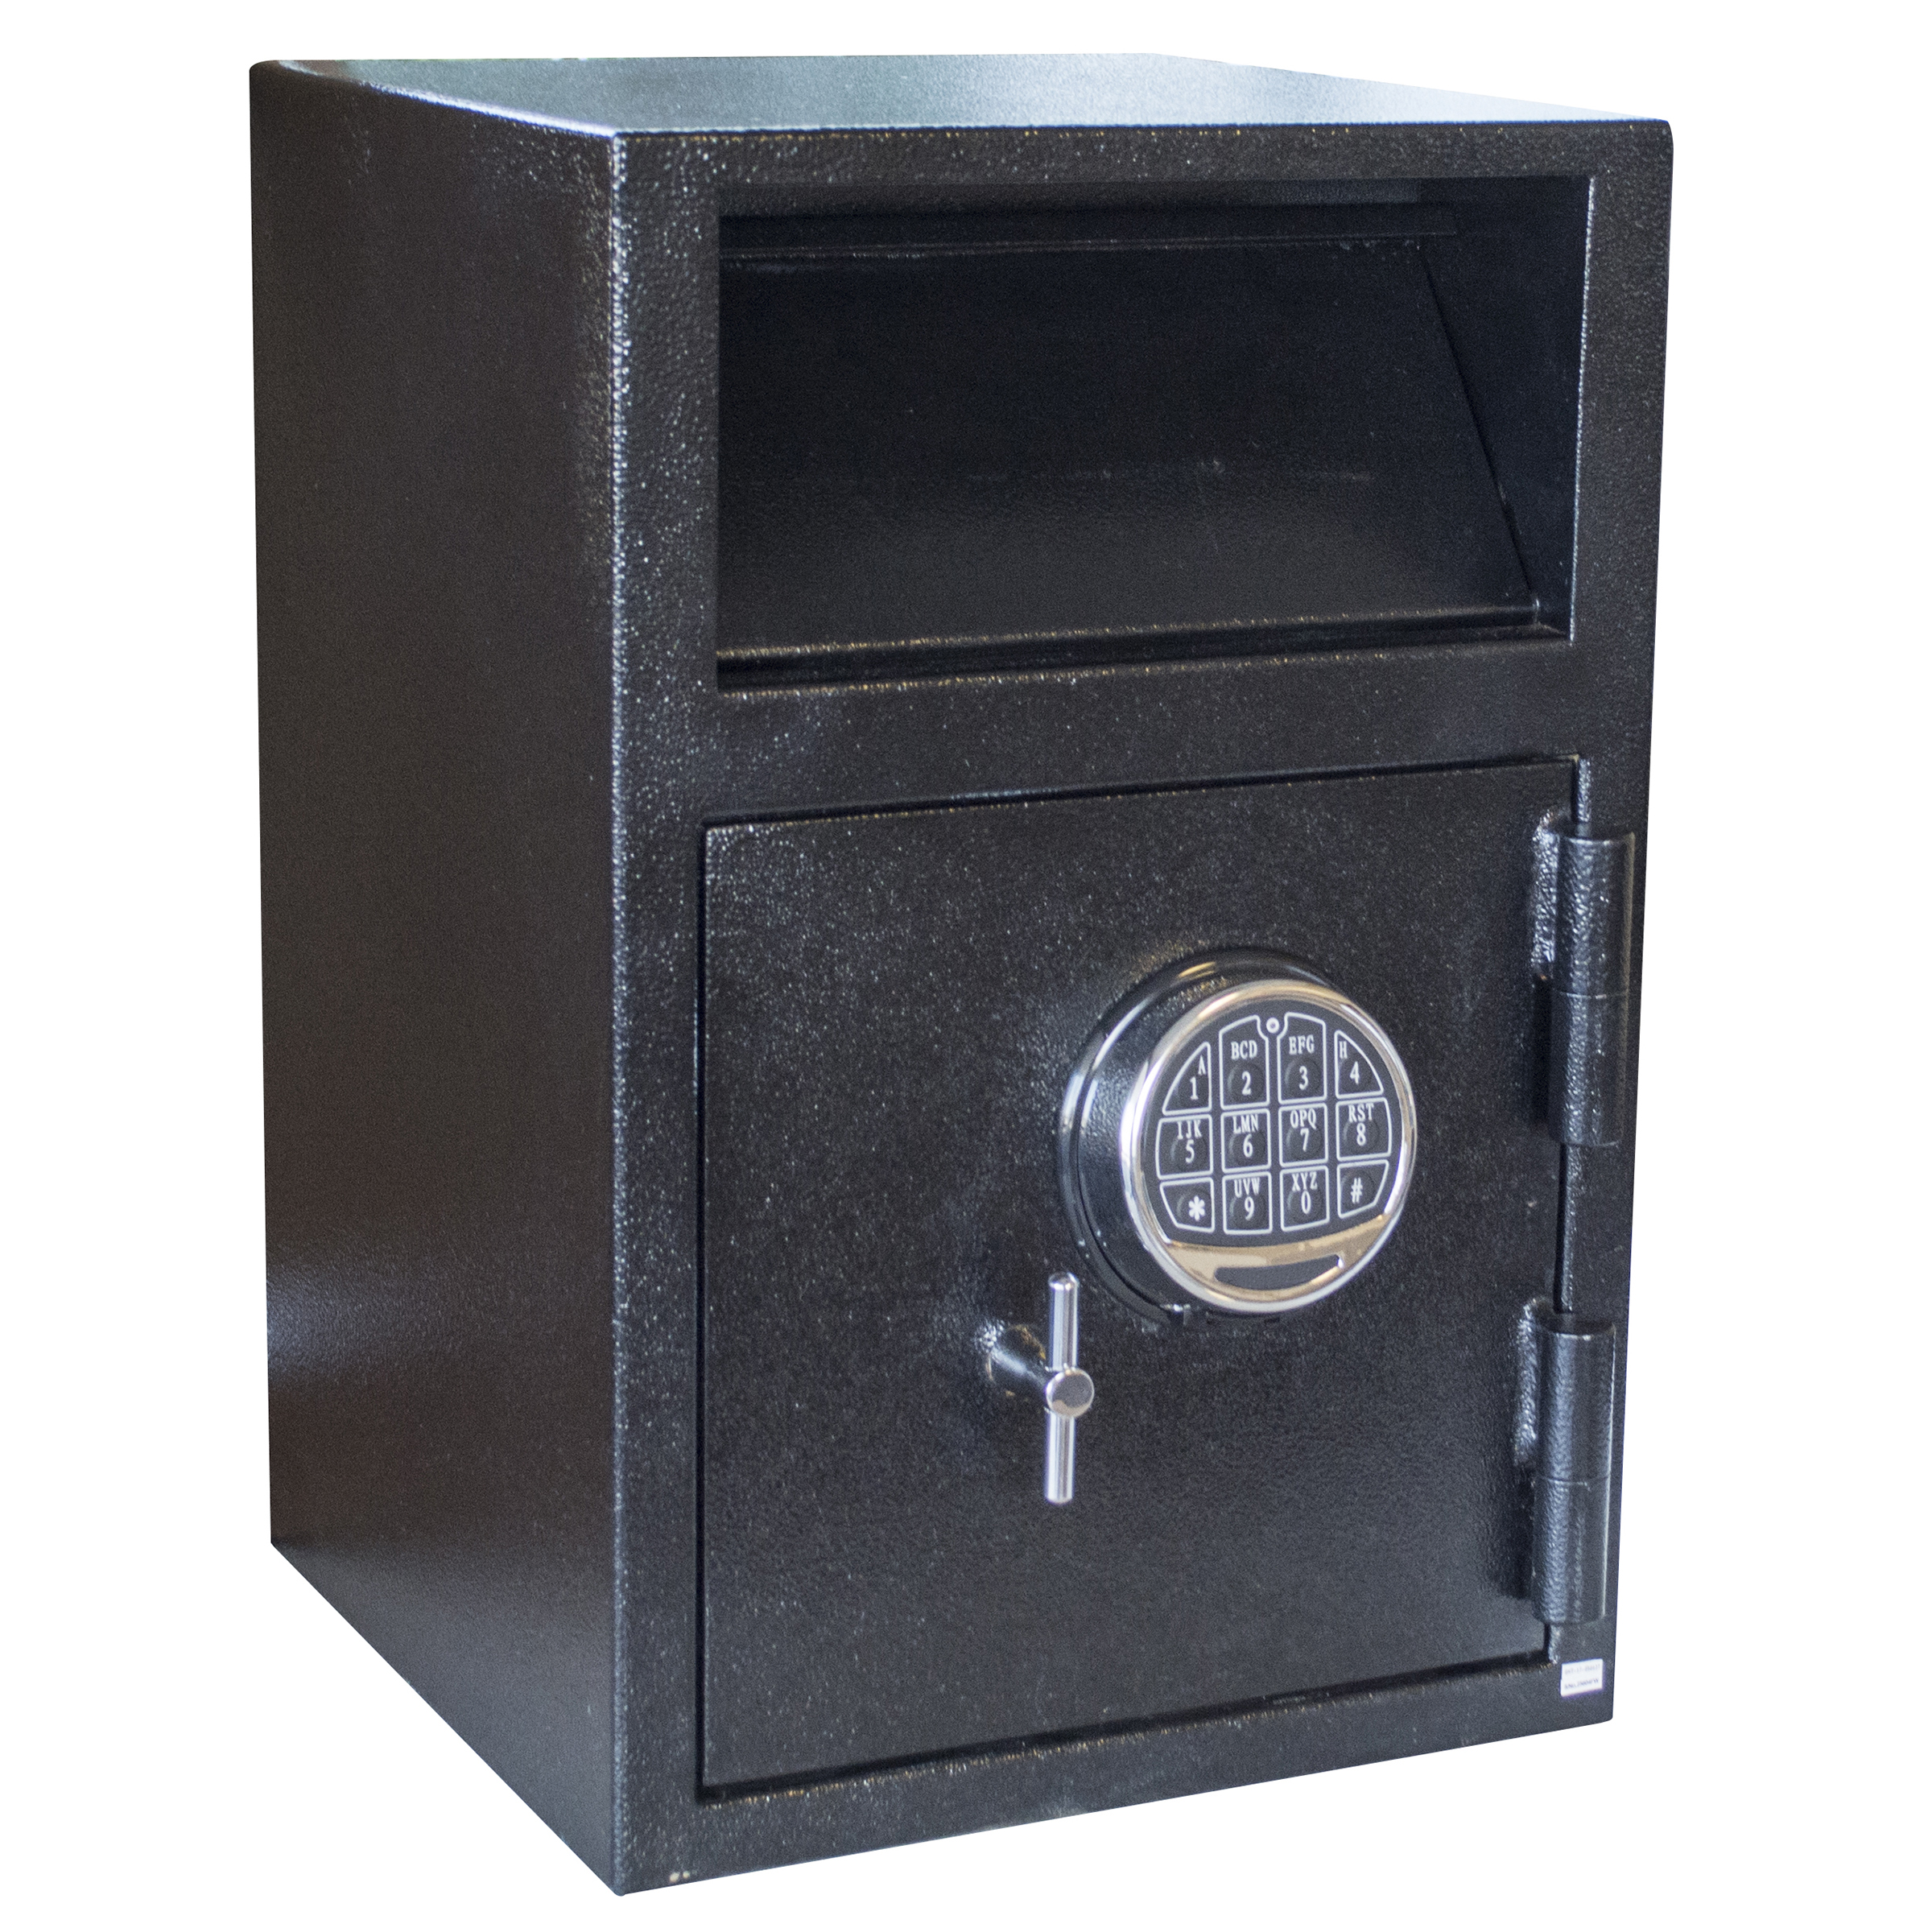 Buffalo Outdoors Deposit Drop Safe with Electronic Lock